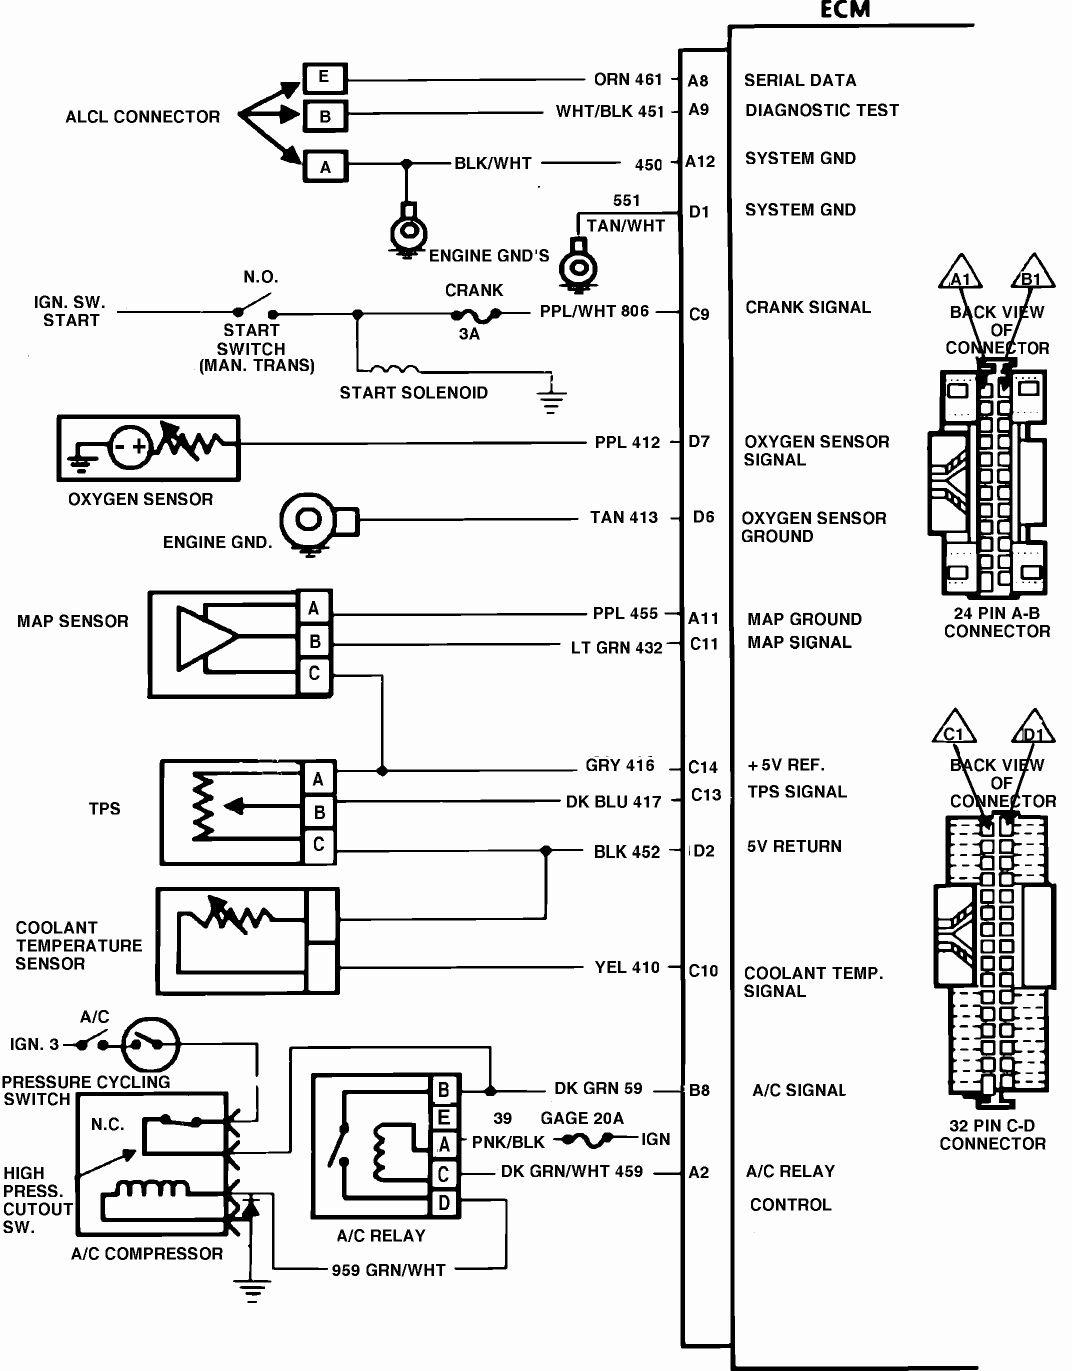 60 Lovely 2004 Chevy Silverado Radio Wiring Diagram Graphics | Wsmce - 2004 Chevy Cavalier Stereo Wiring Diagram